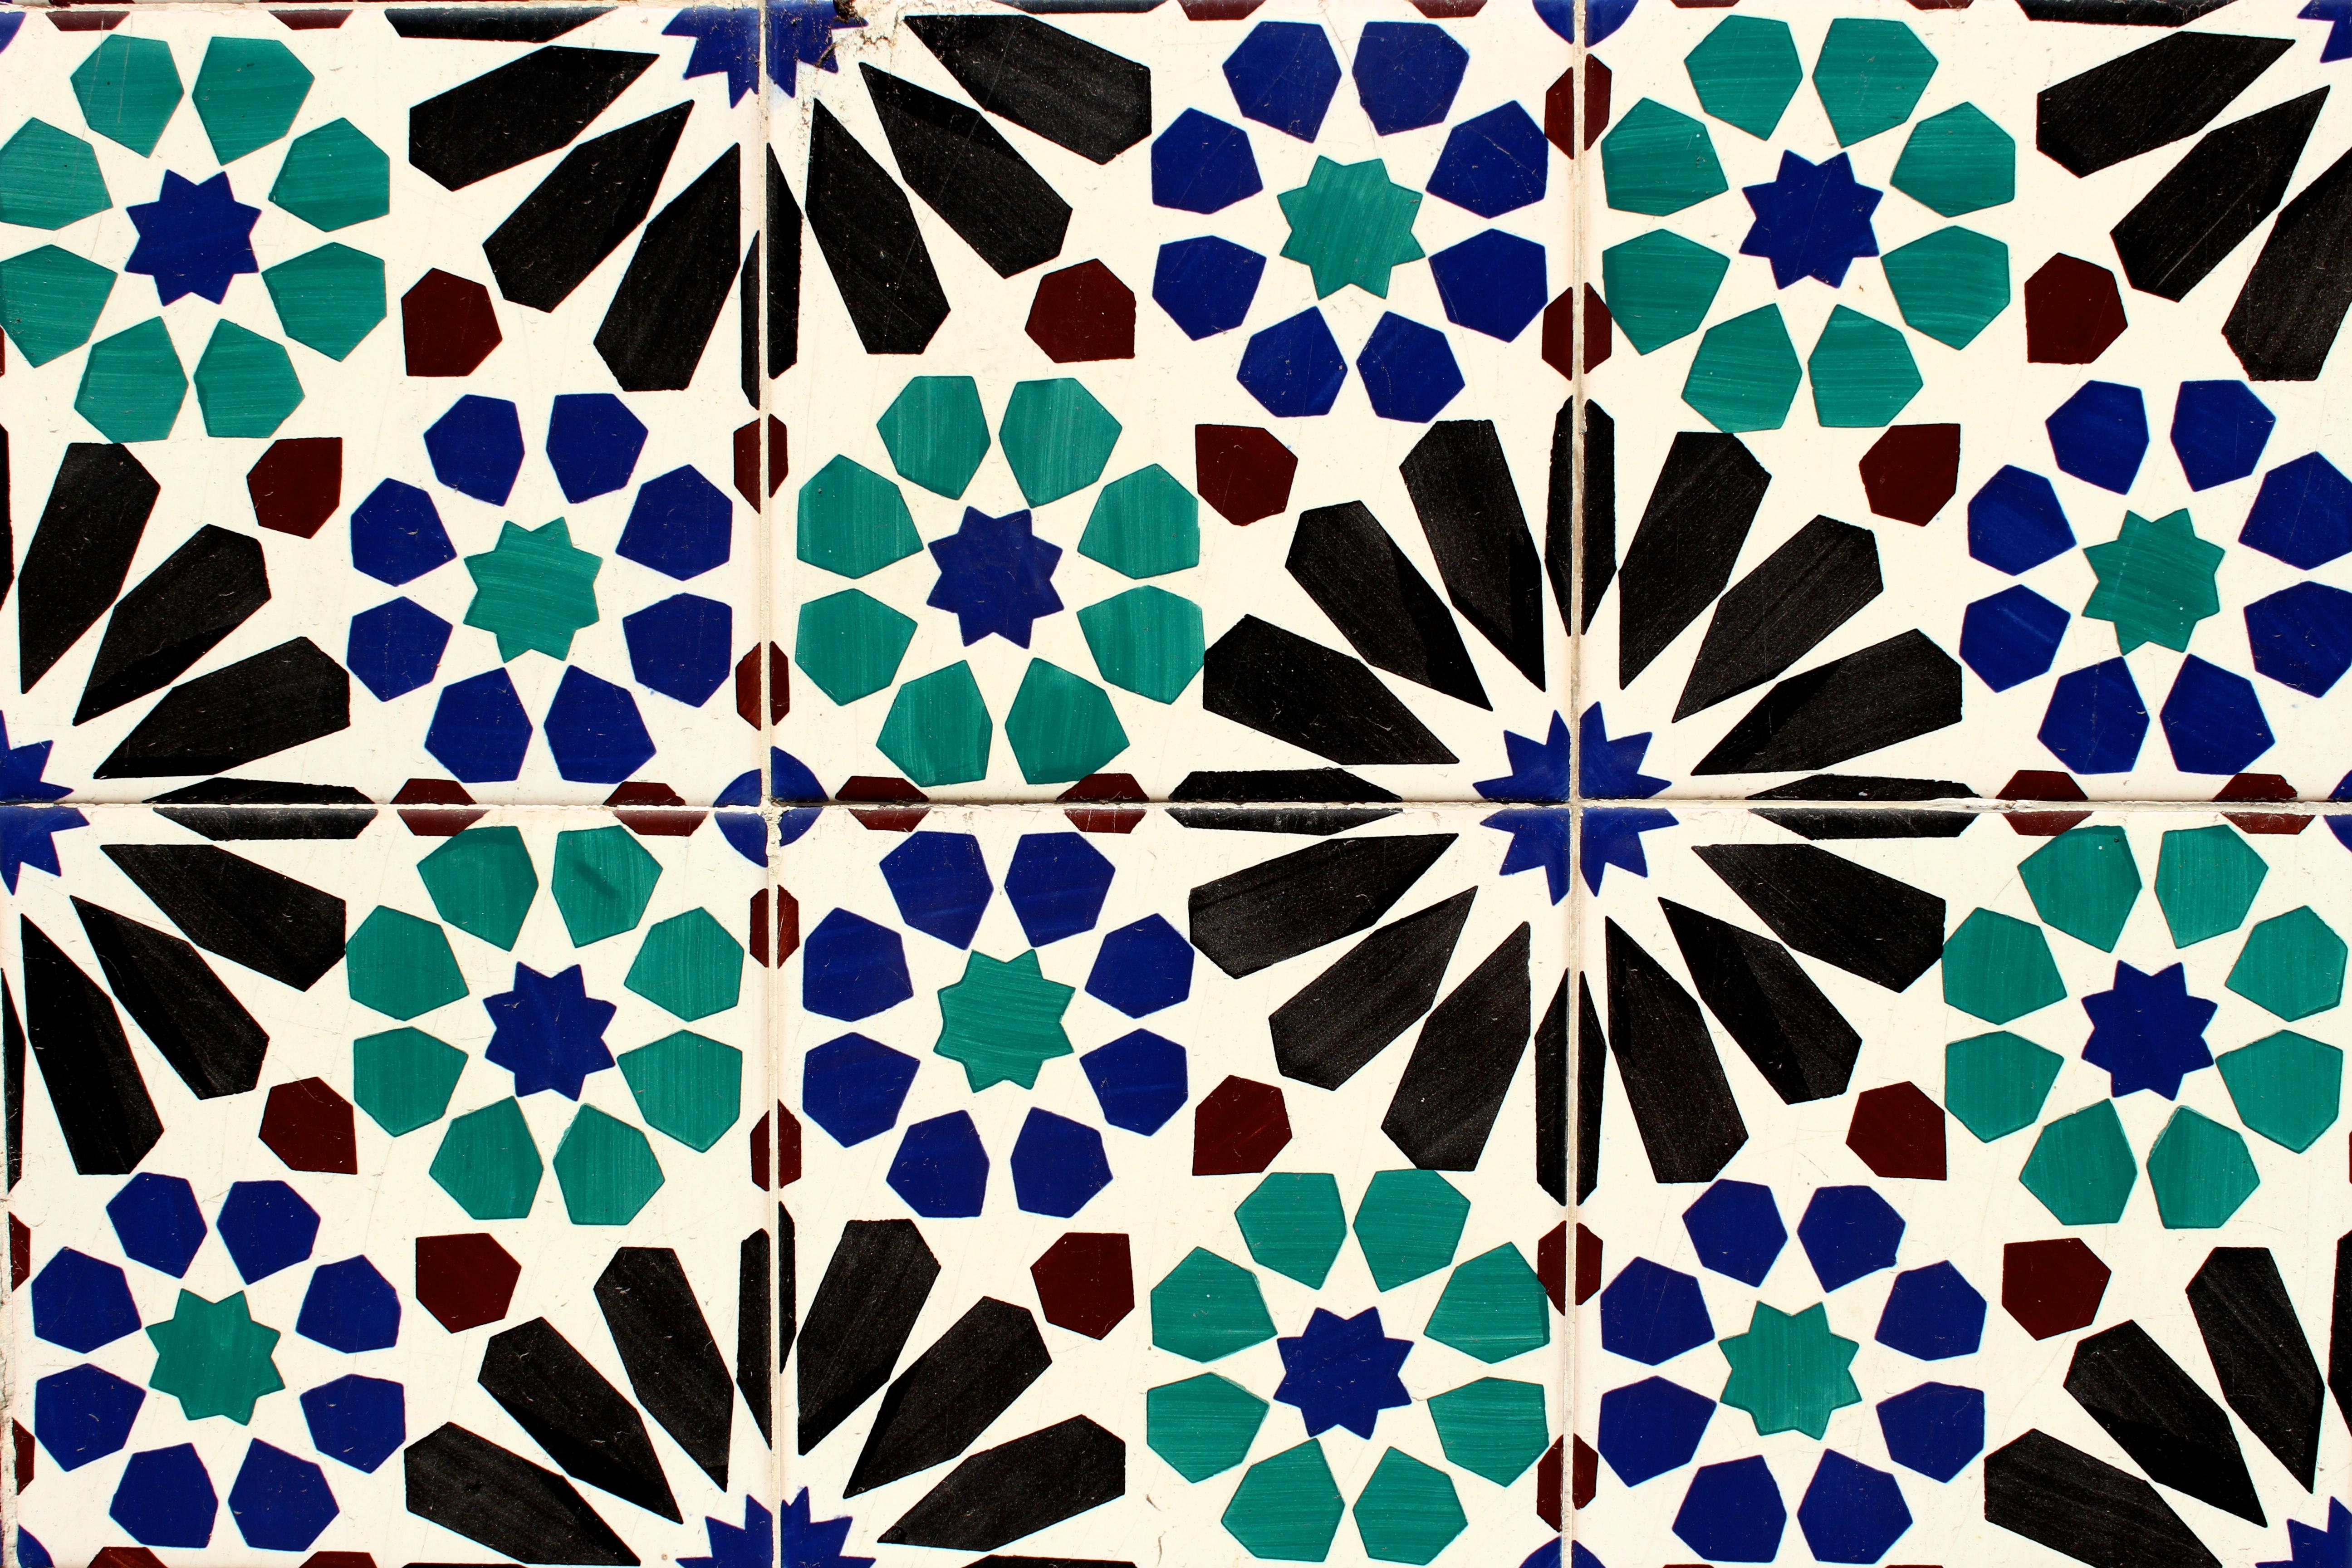 Azulejaria in Lisbon